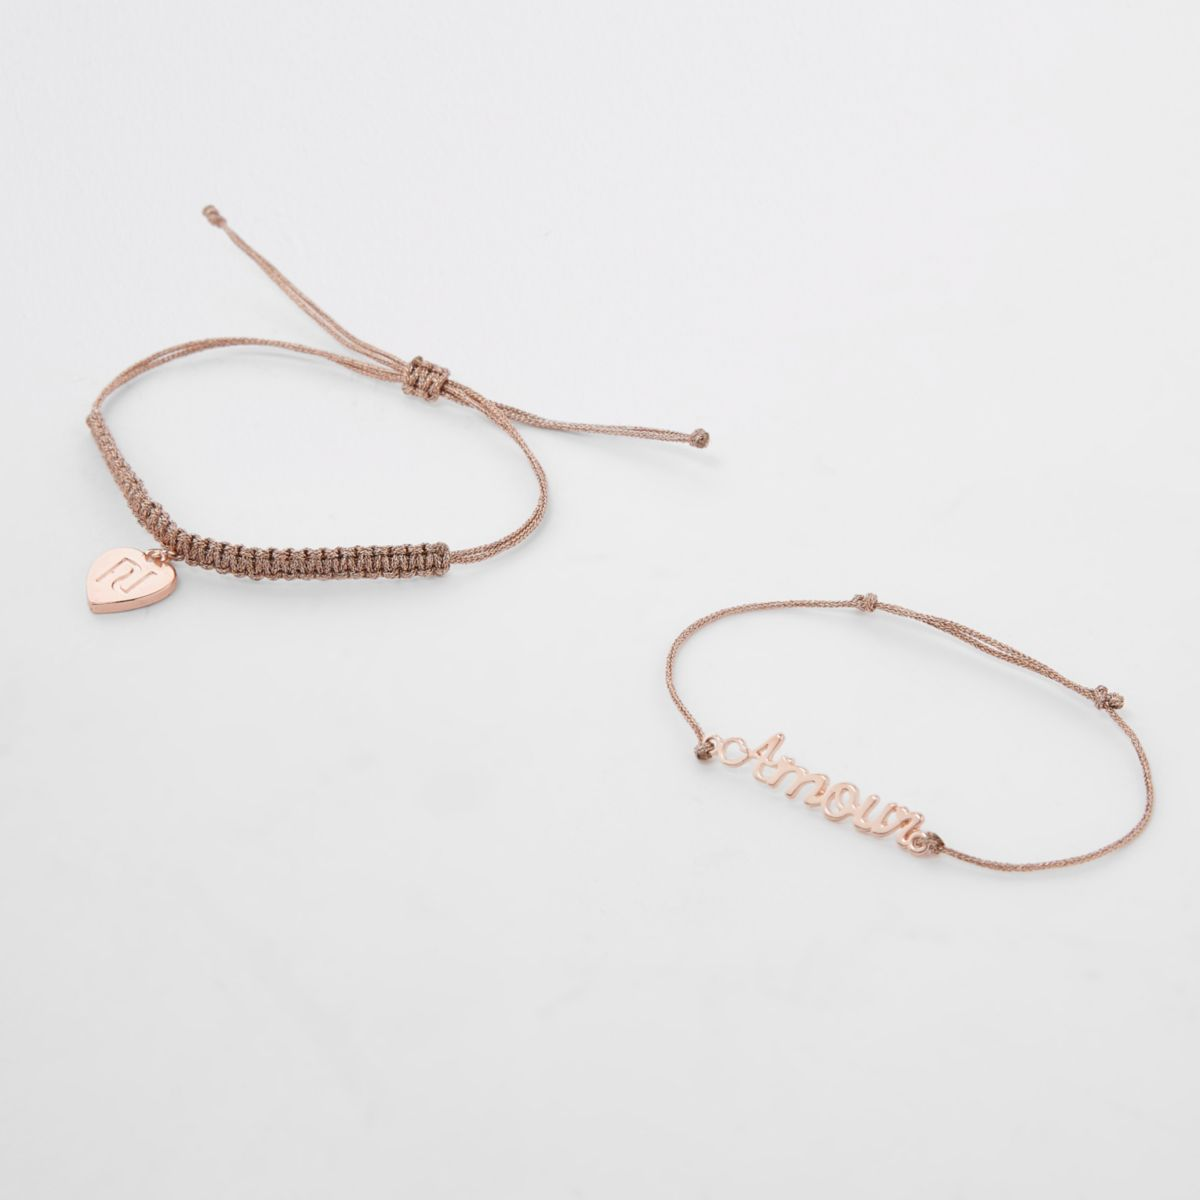 Girls rose gold tone friendship bracelet